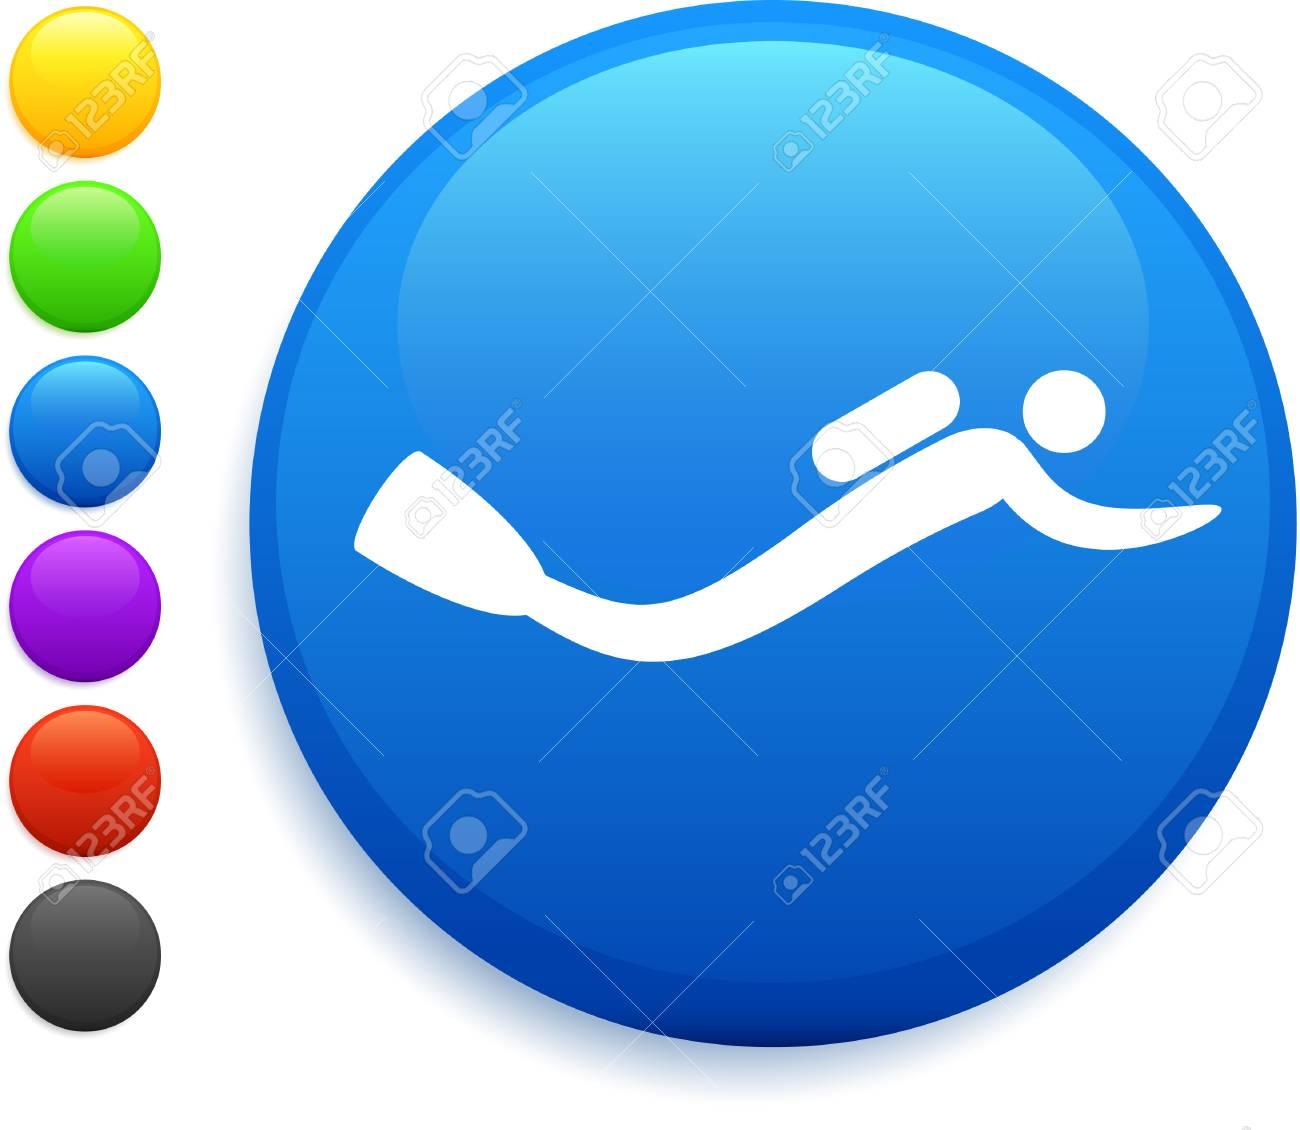 scuba icon on round internet buttonoriginal vector illustration6 color versions included Stock Vector - 22419075